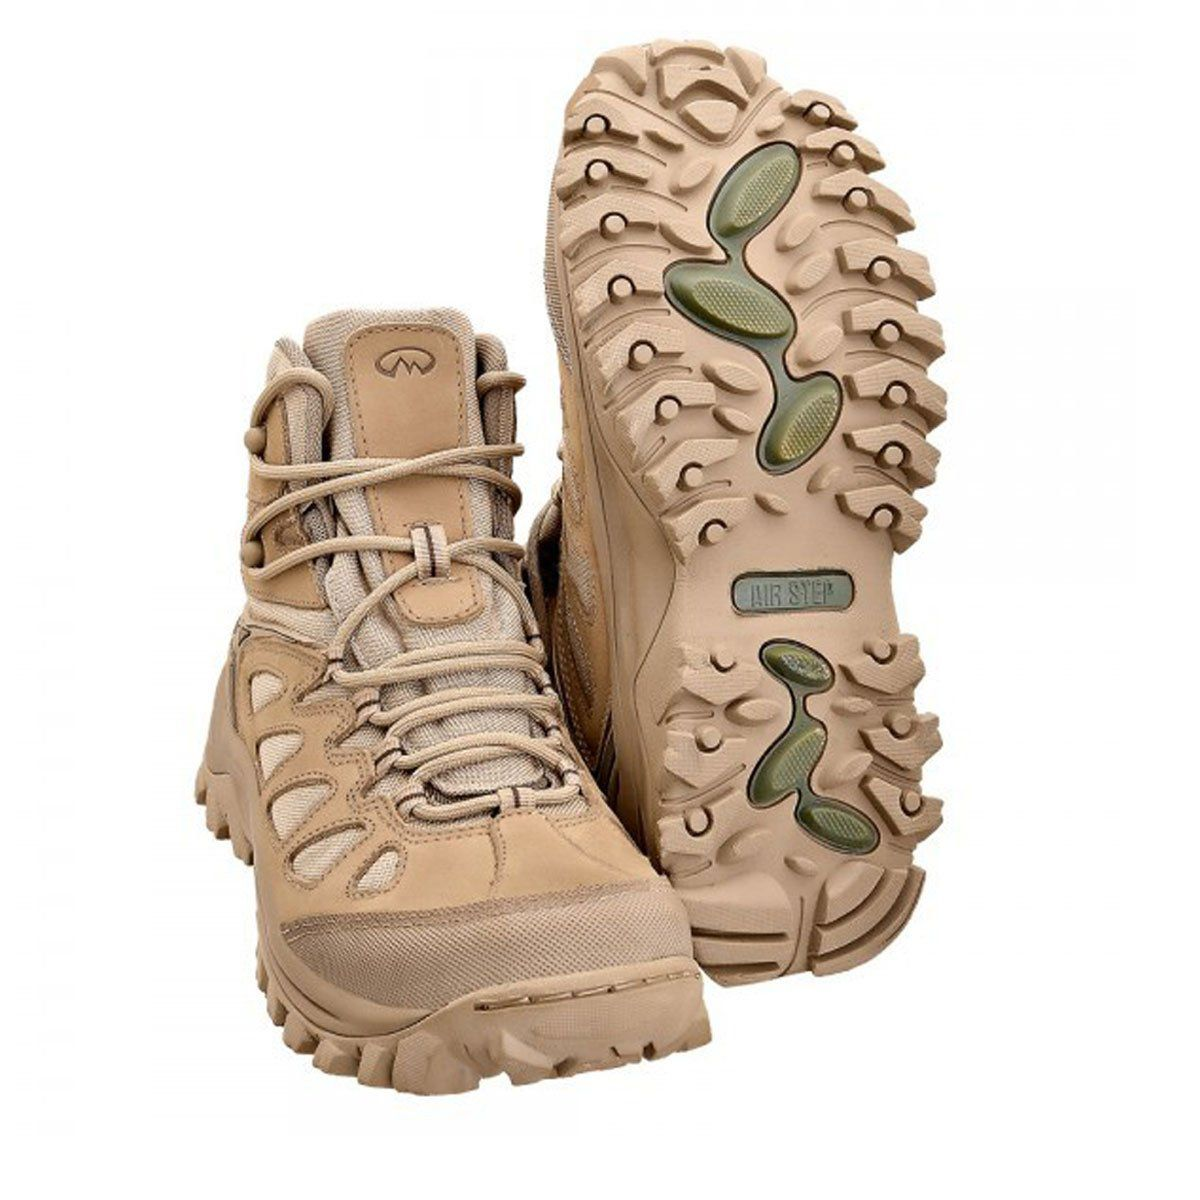 Bota Airstep 5700-25 Hiking Boot Bravo 10 Tan